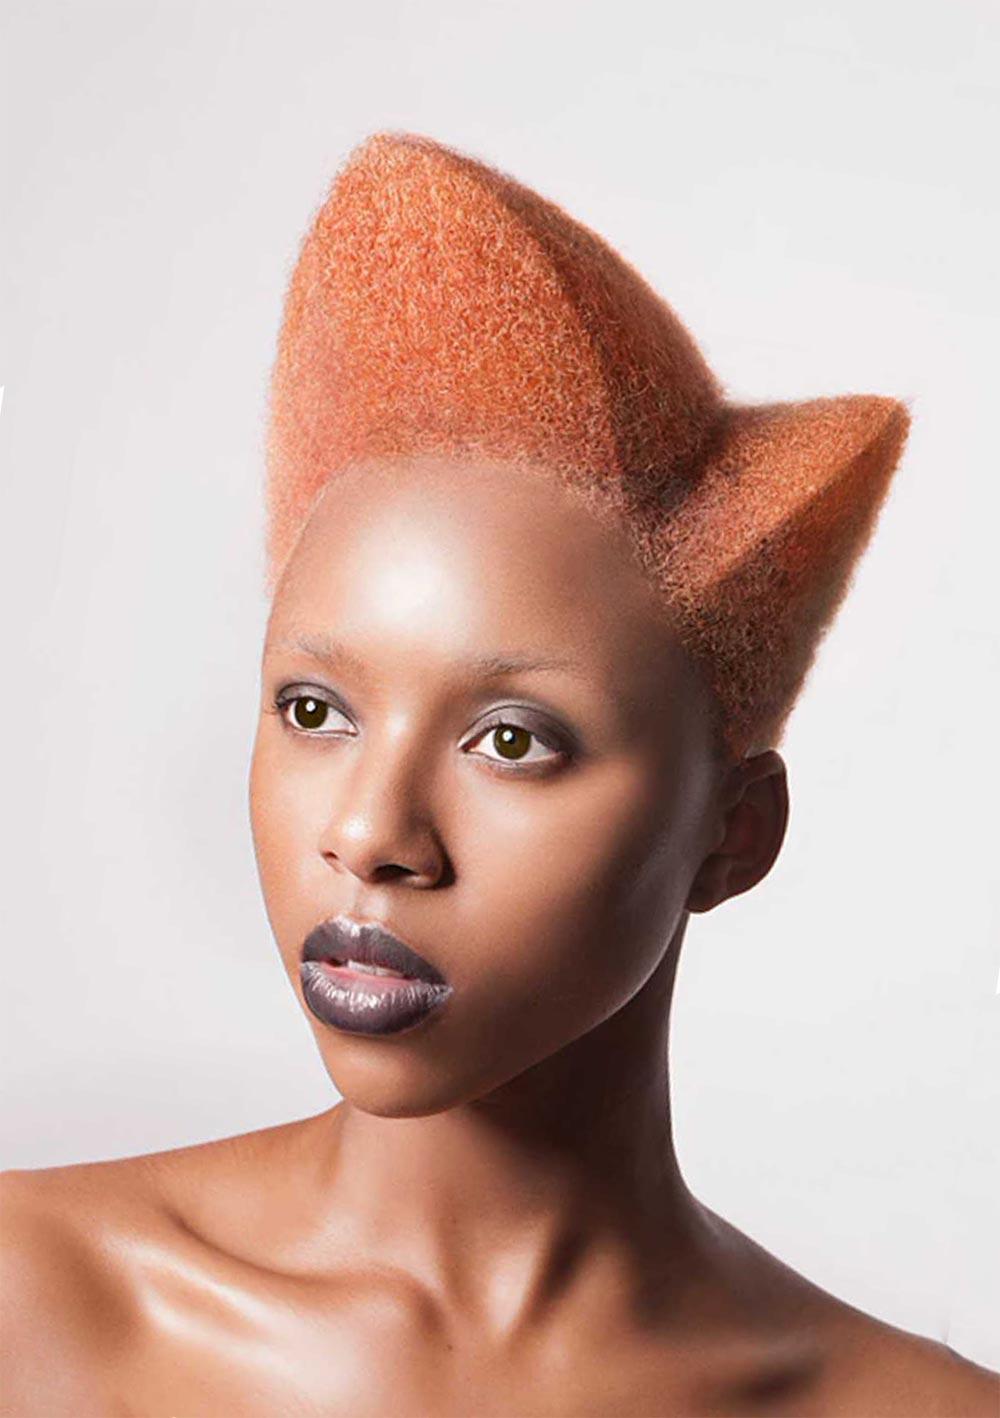 Lisa Farrall Лиза Фаррел: Amour - невероятная коллекция афропричесок